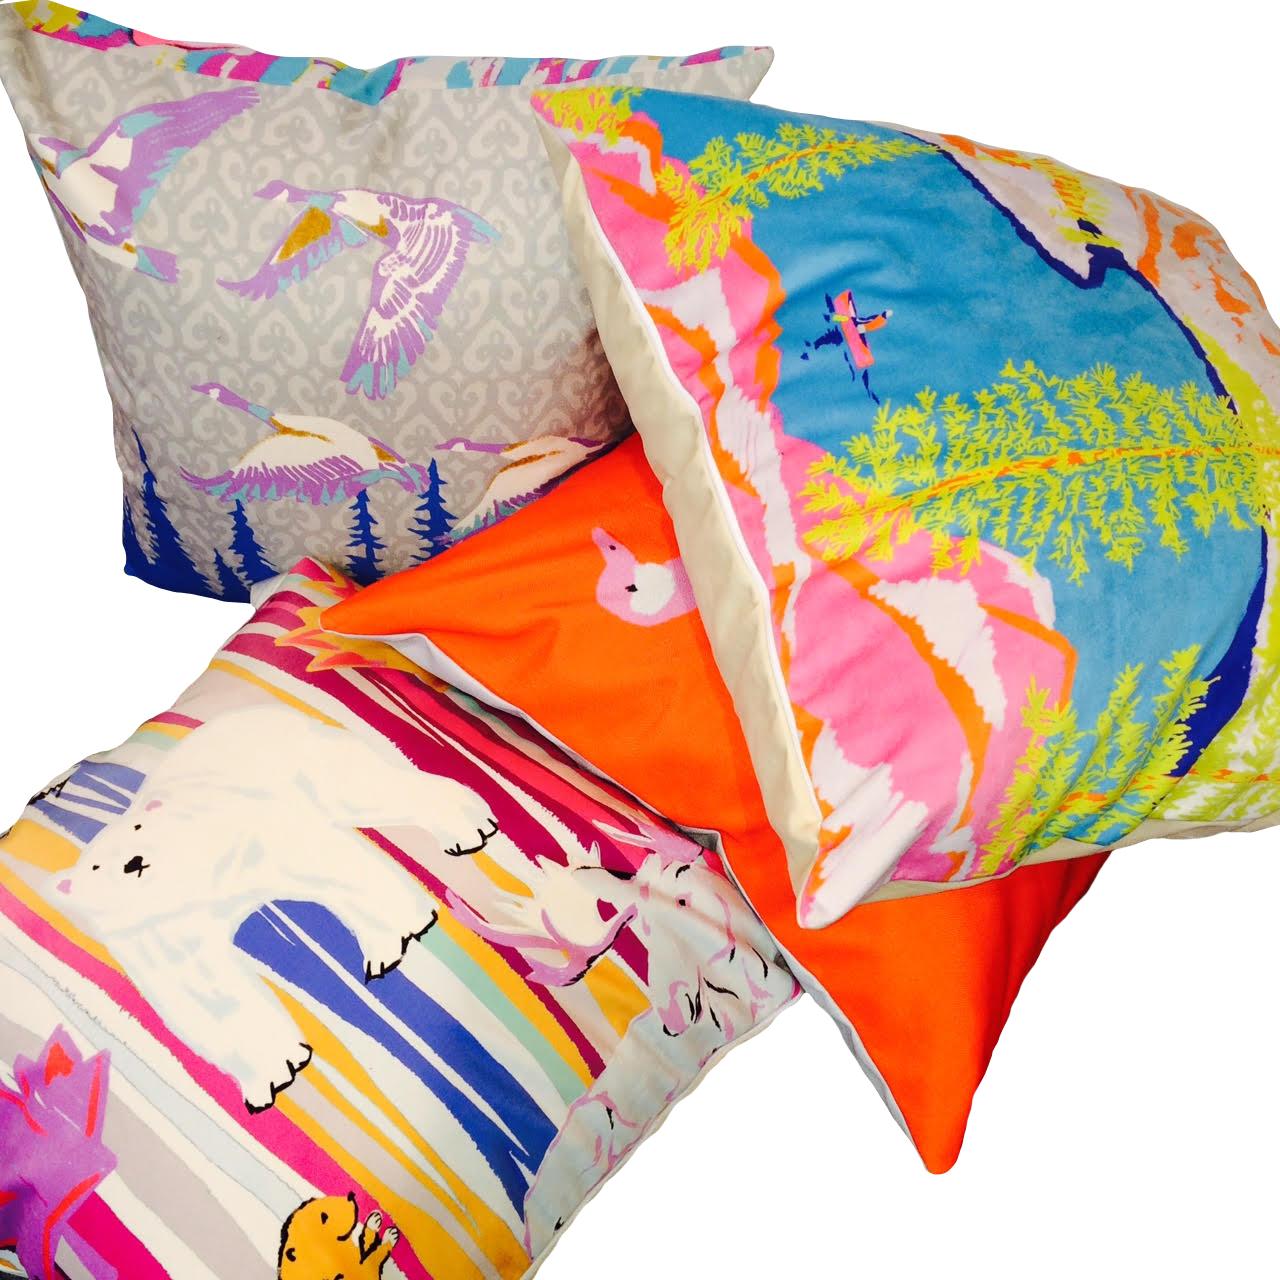 Canadiana Pillows